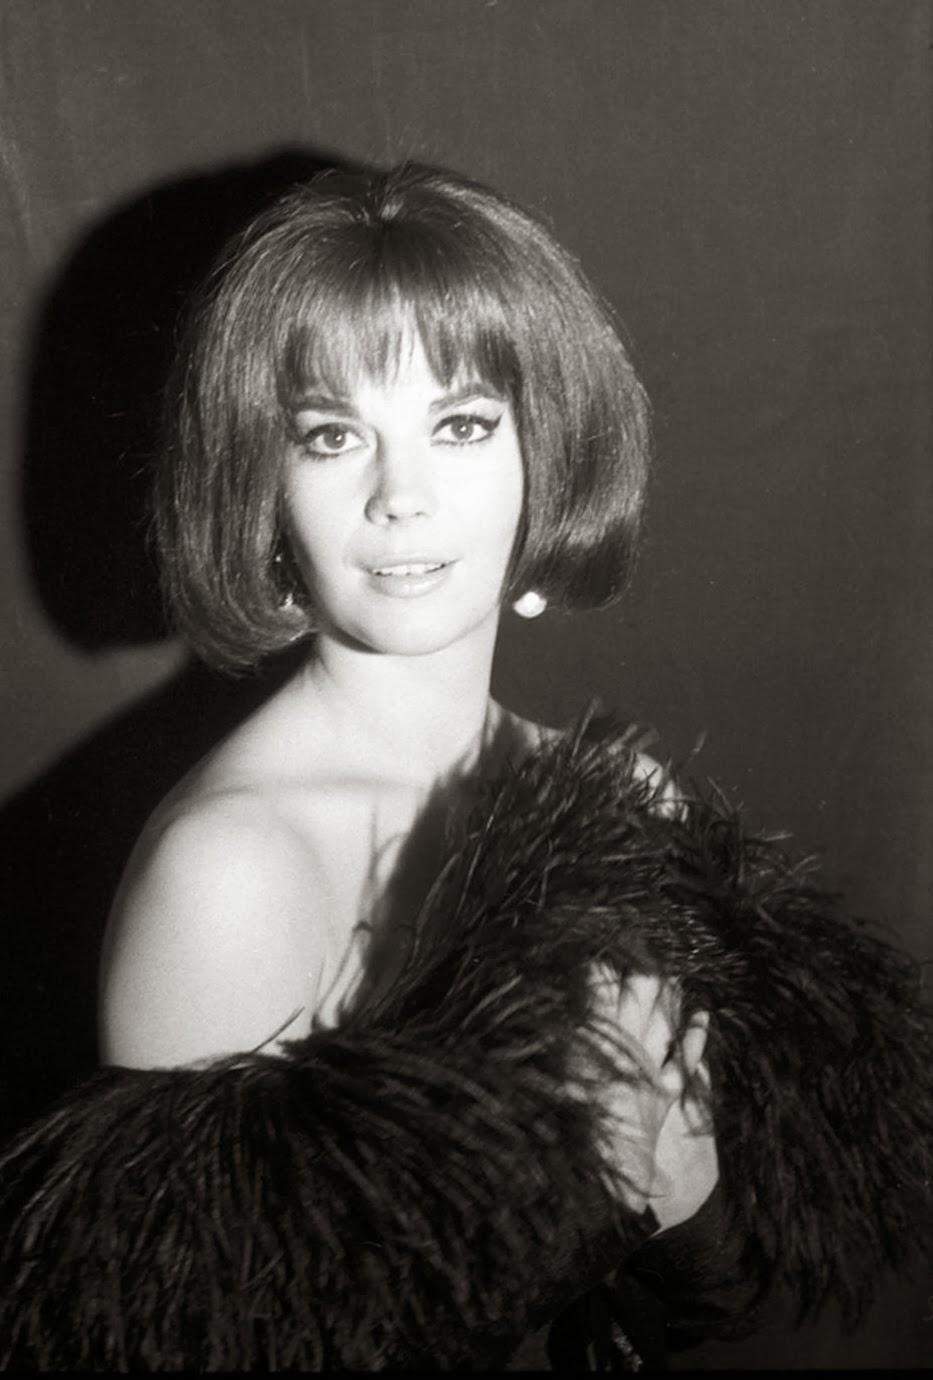 Film Noir Photos: The Eyes Have It: Natalie Wood